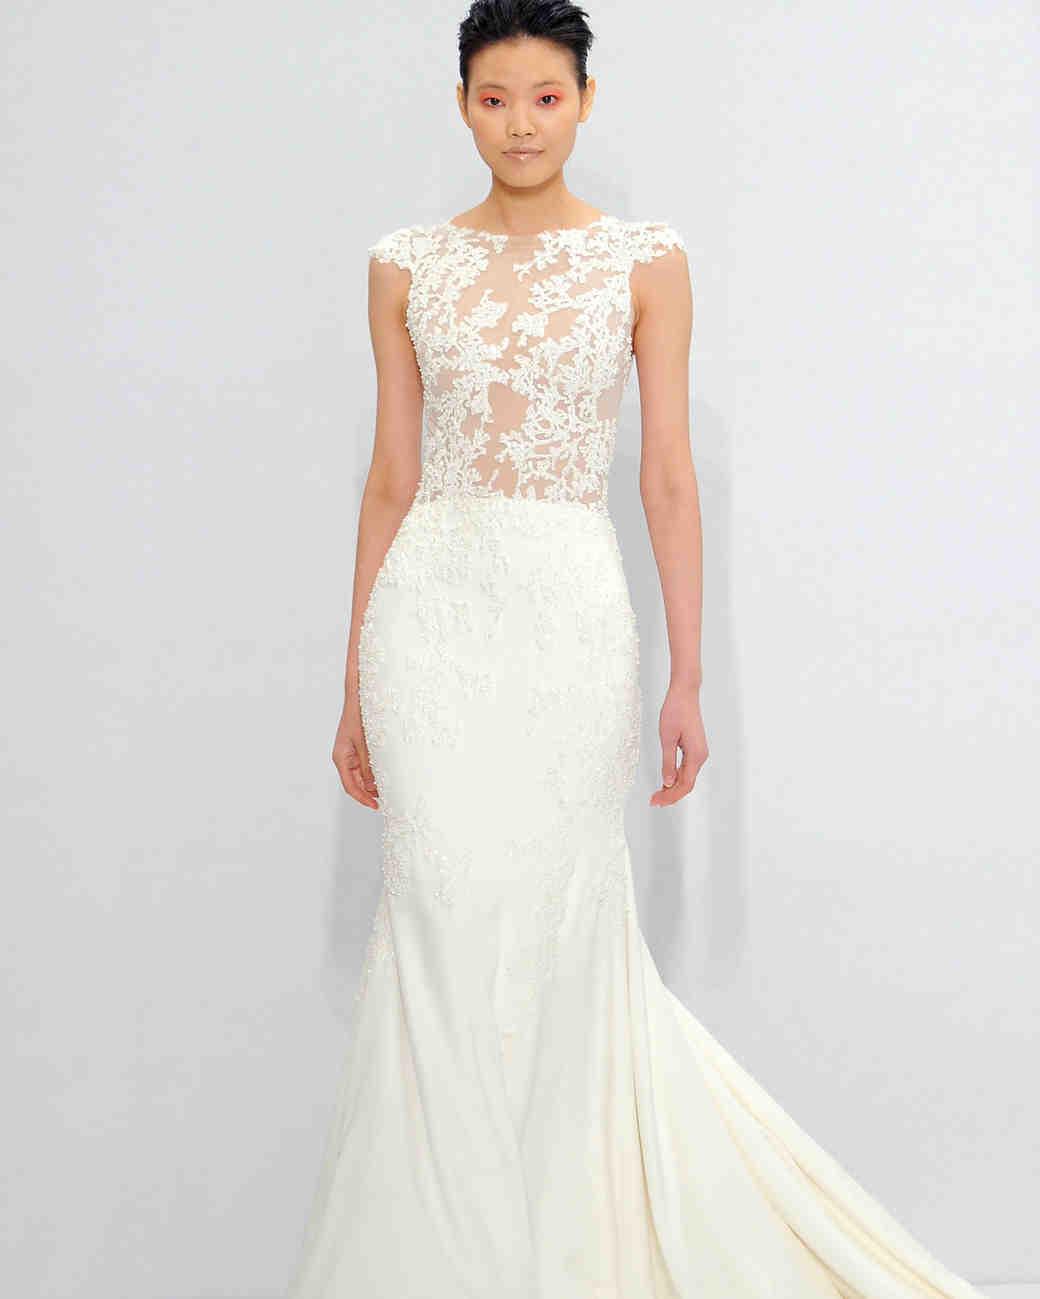 Mark Zunino Wedding Dresses | Dress images